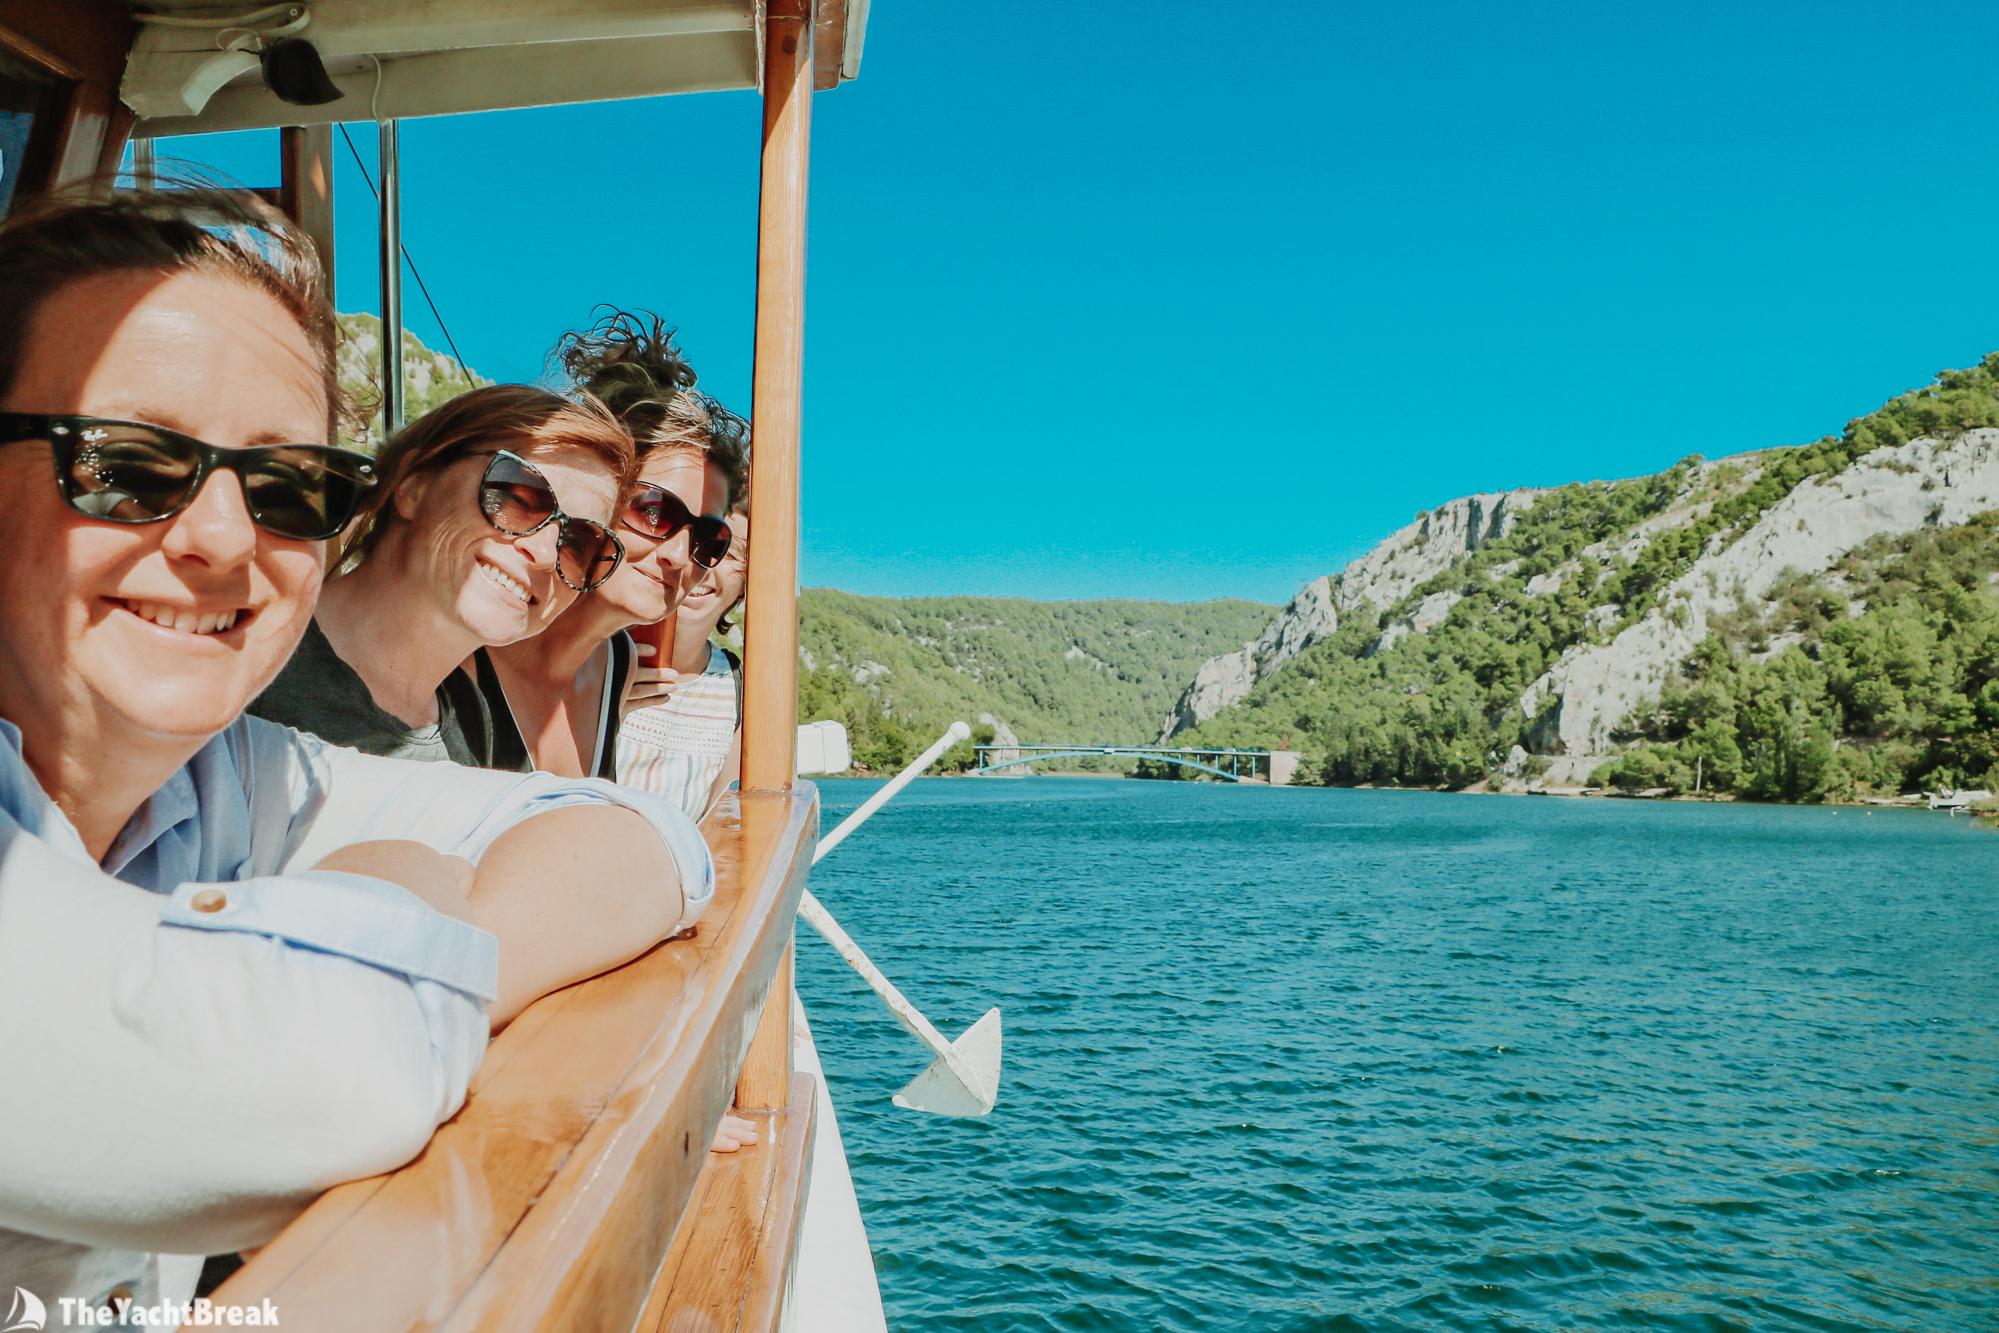 Ladies enjoying a sailing holiday in Croatia